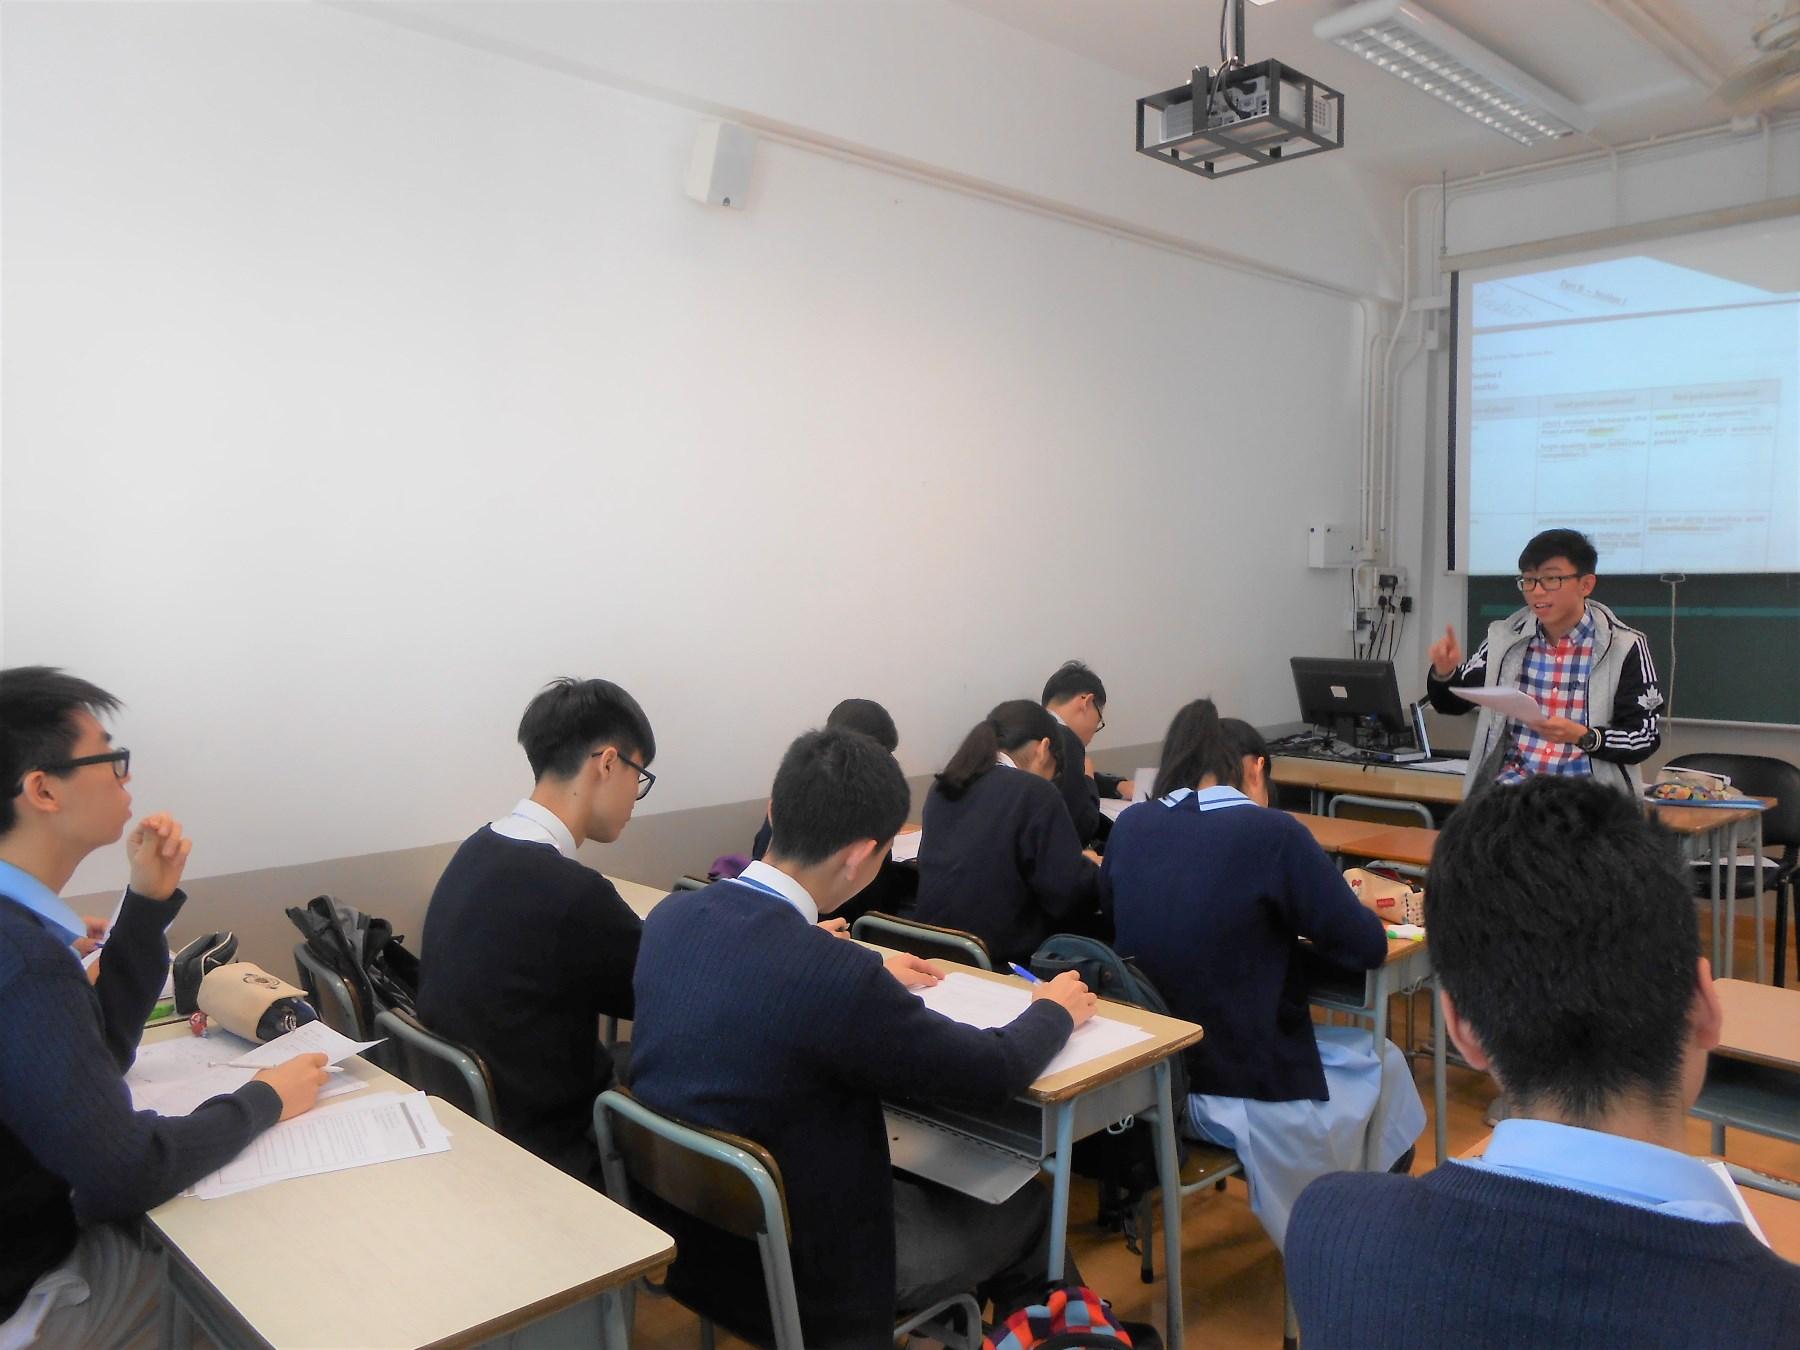 http://npc.edu.hk/sites/default/files/dscn9871.jpg